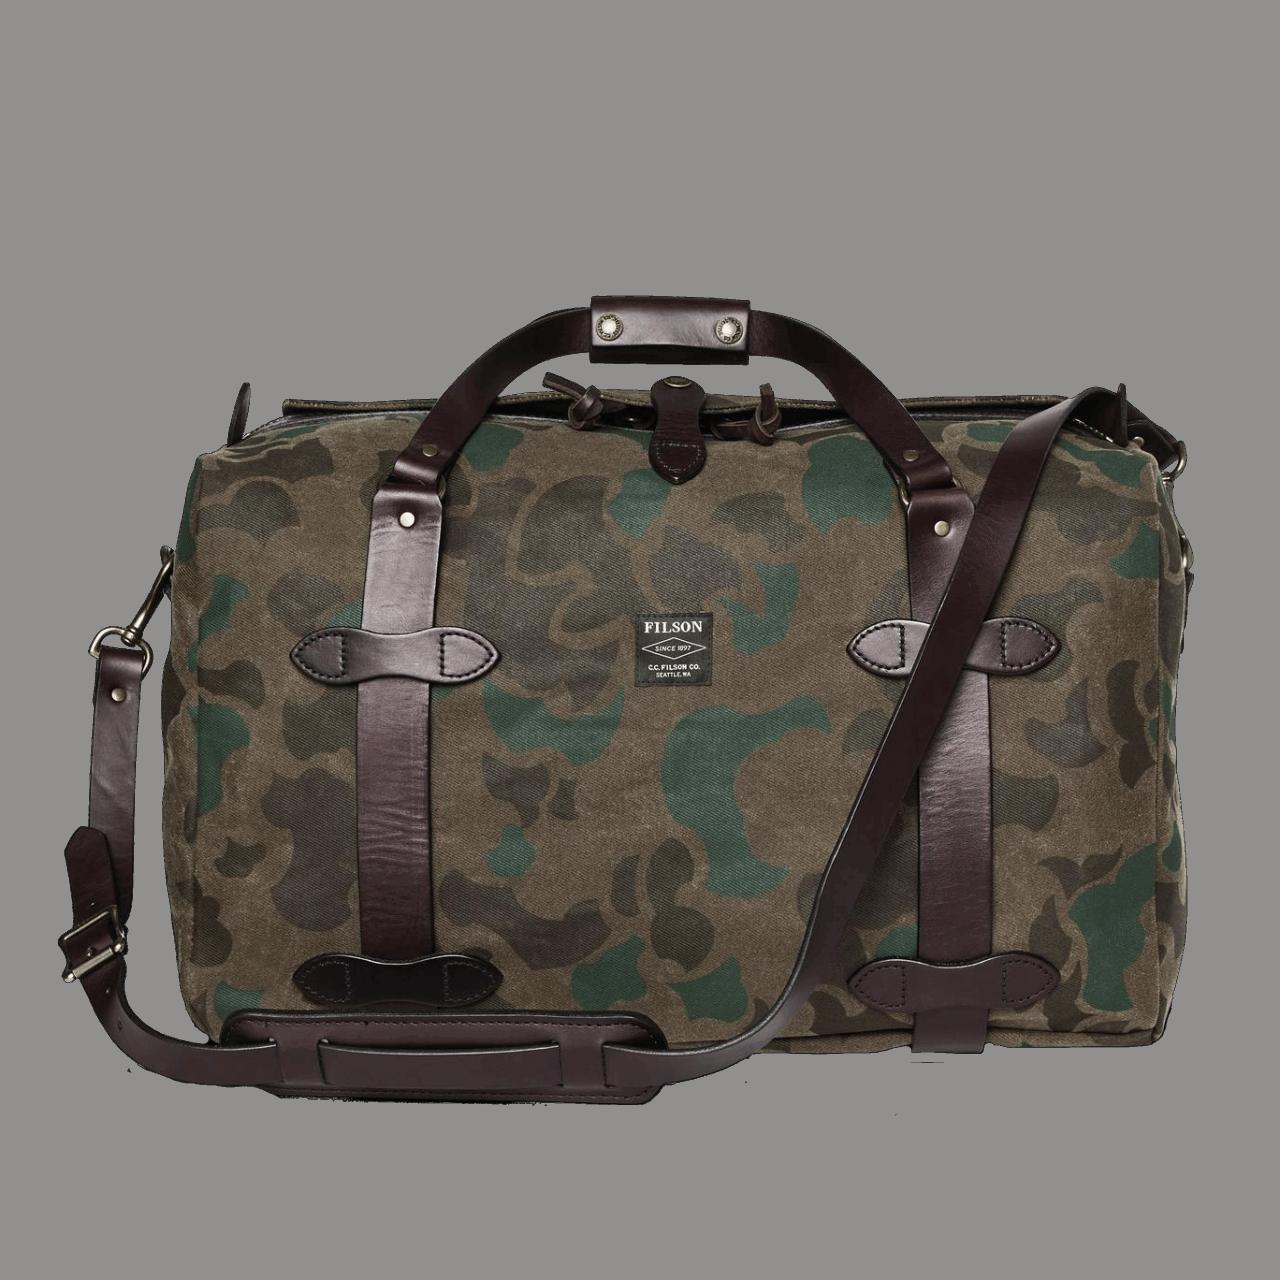 Filson Medium Rugged Twill Duffle Bag - Camo